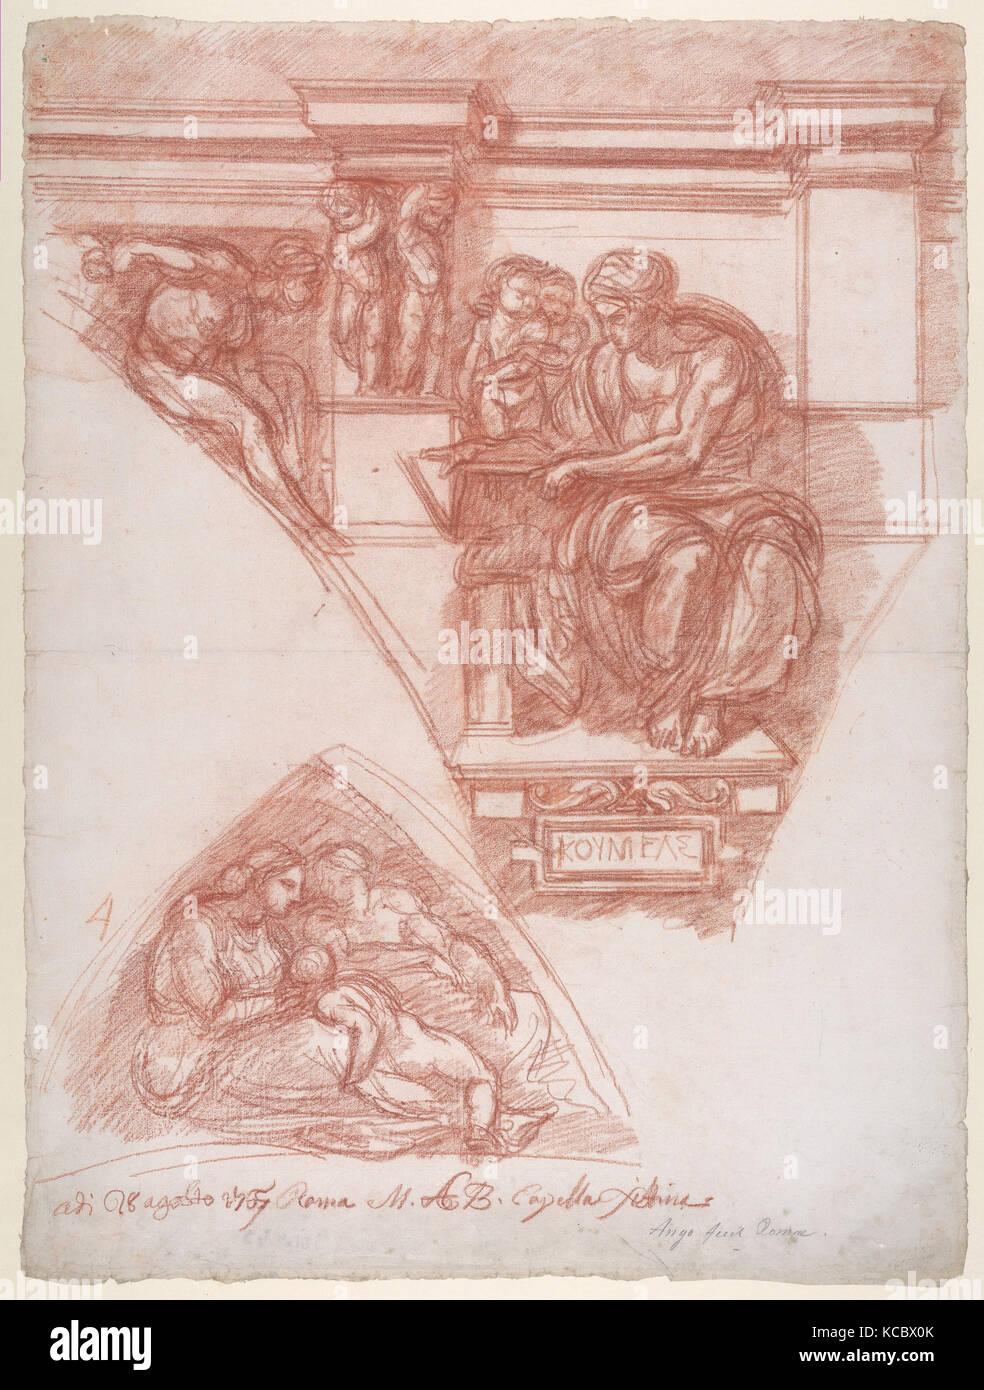 The Cumaean Sibyl (after Michelangelo), Jean Robert Ango, 1767 - Stock Image